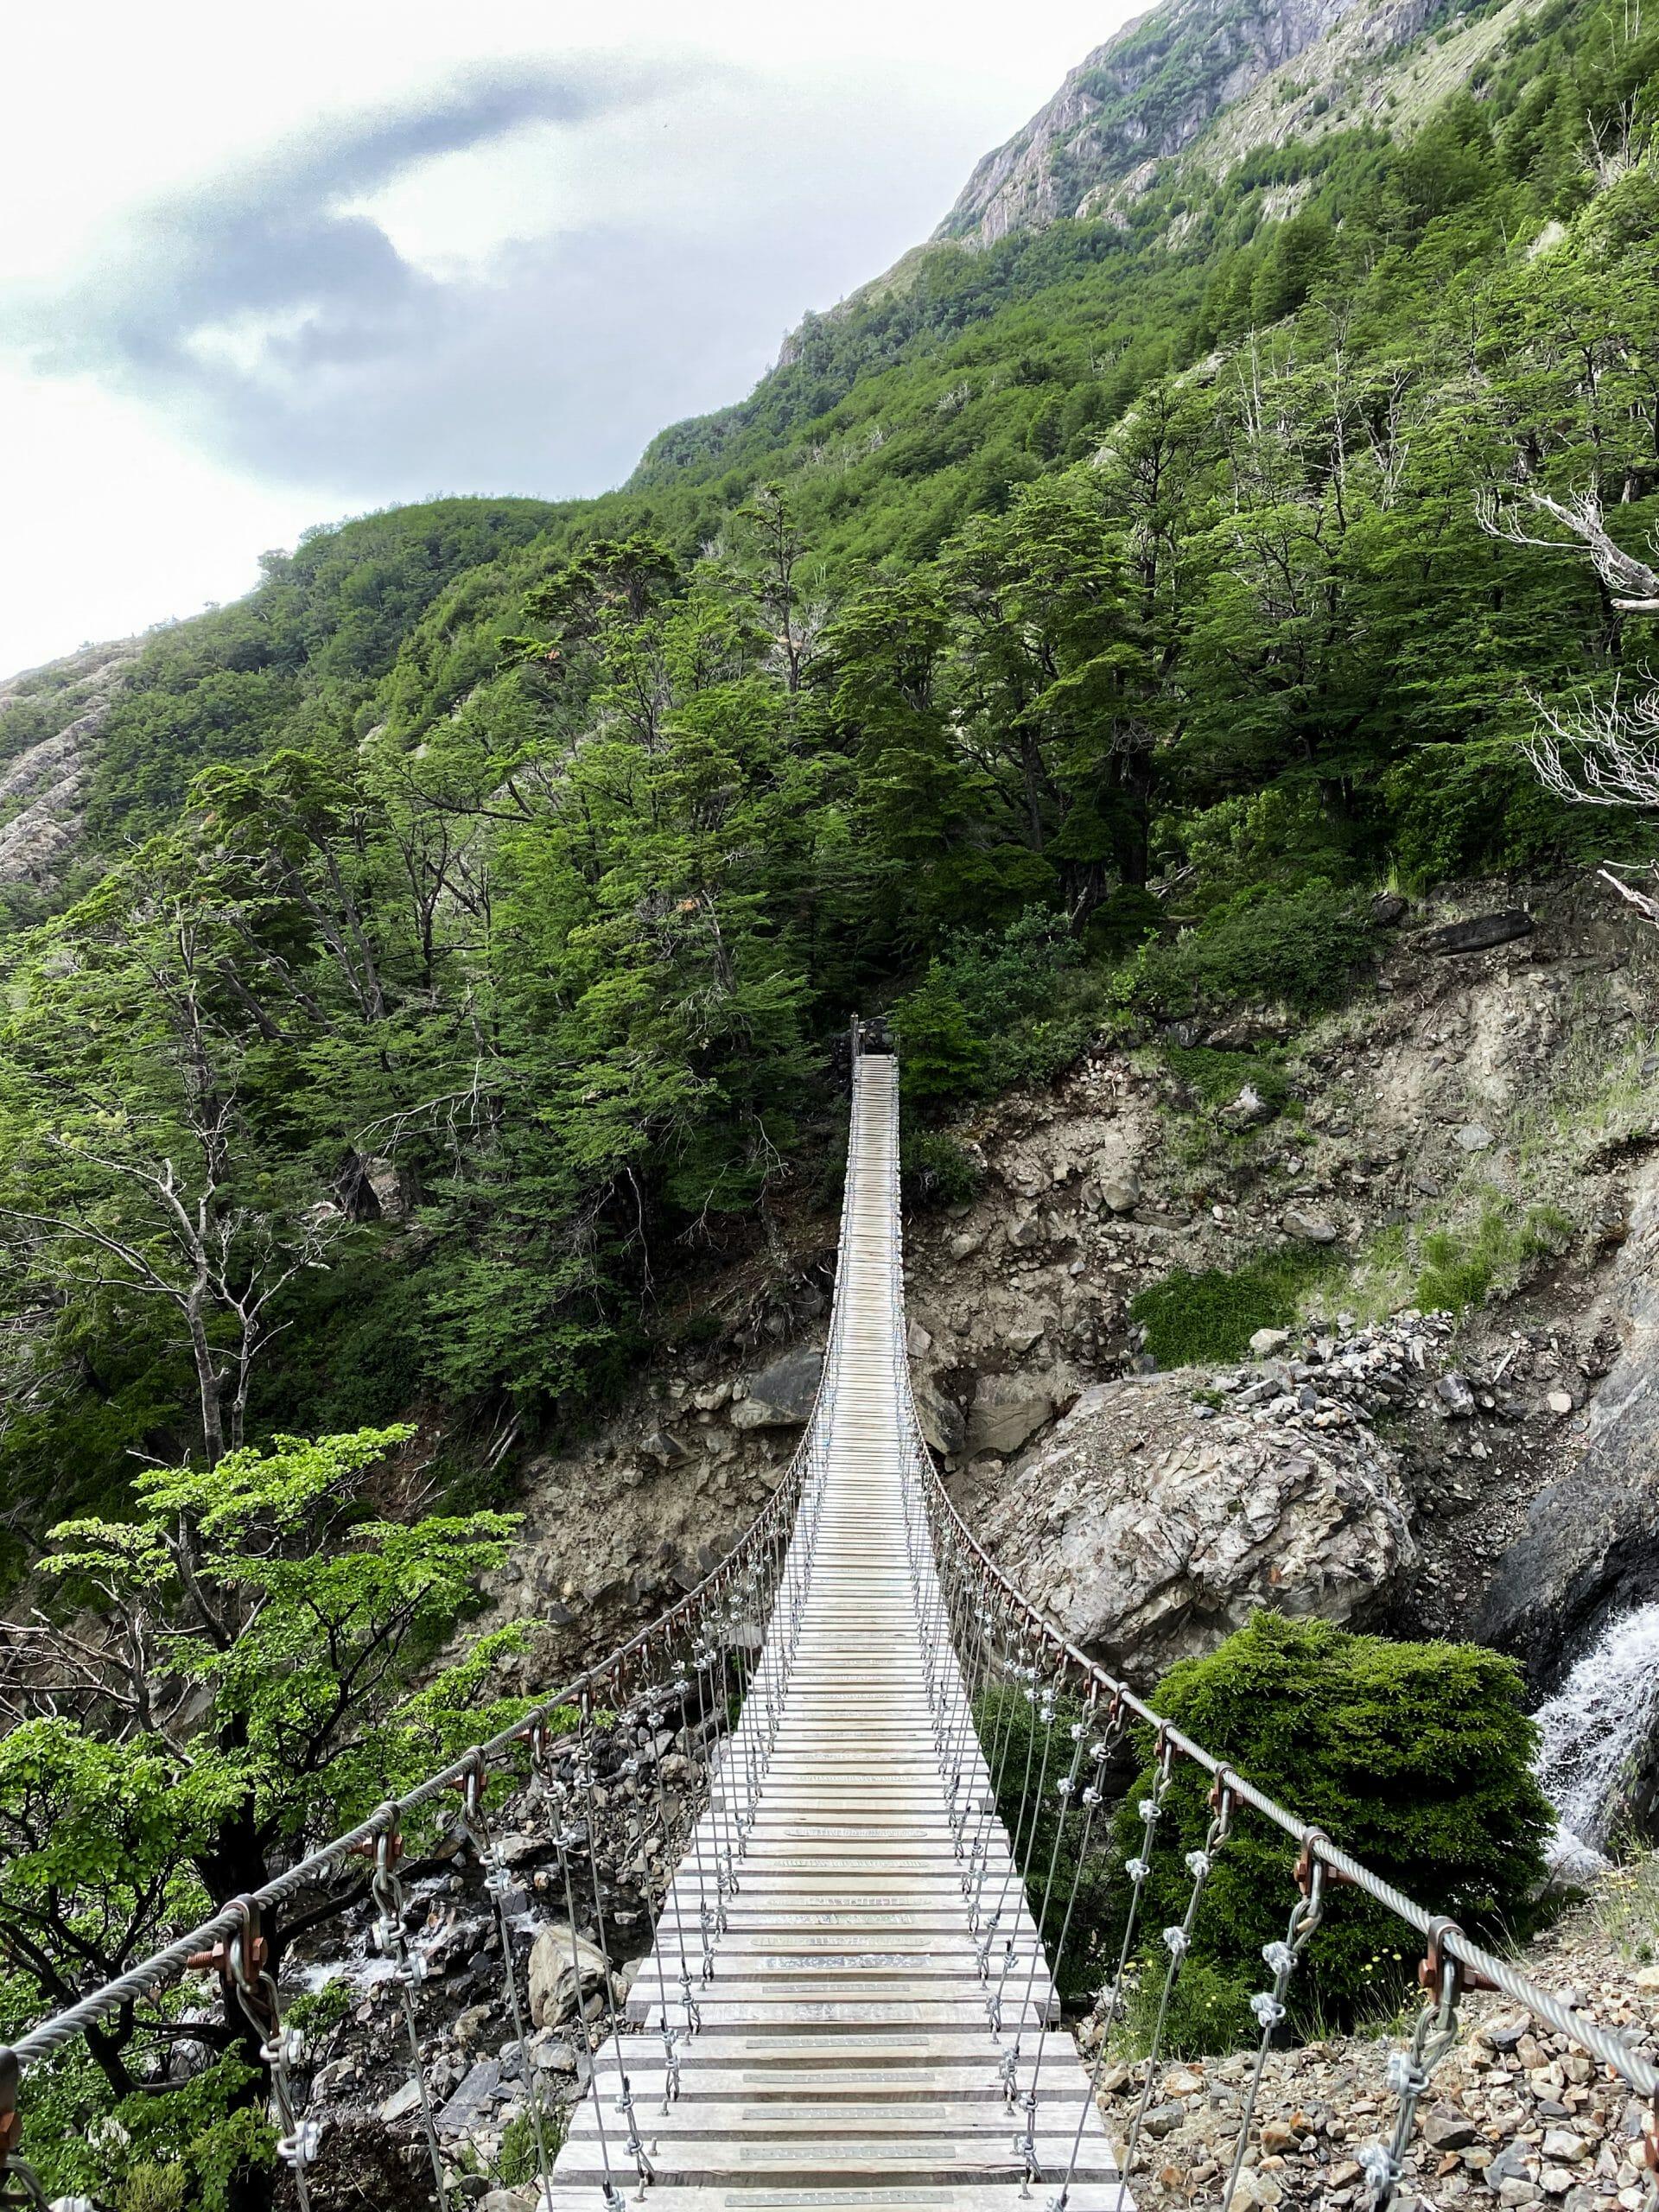 Suspension bridge at Grey